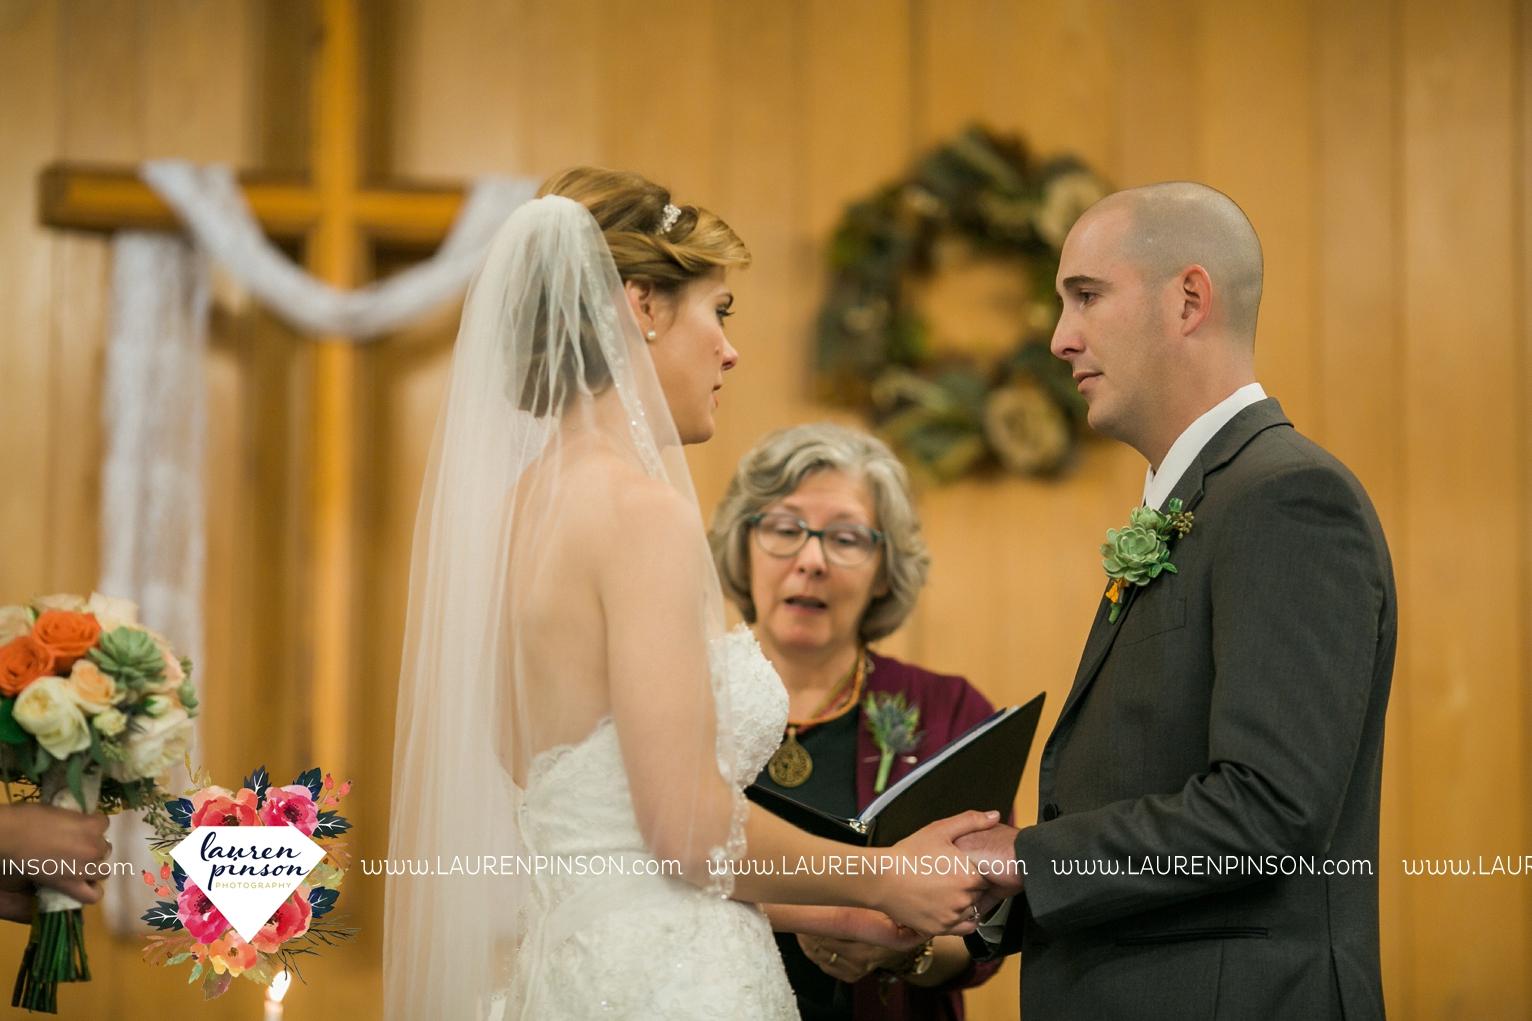 kemp-center-for-the-arts-wichita-falls-texas-wedding-photographer-fall-wedding-pumpkins-157.jpg